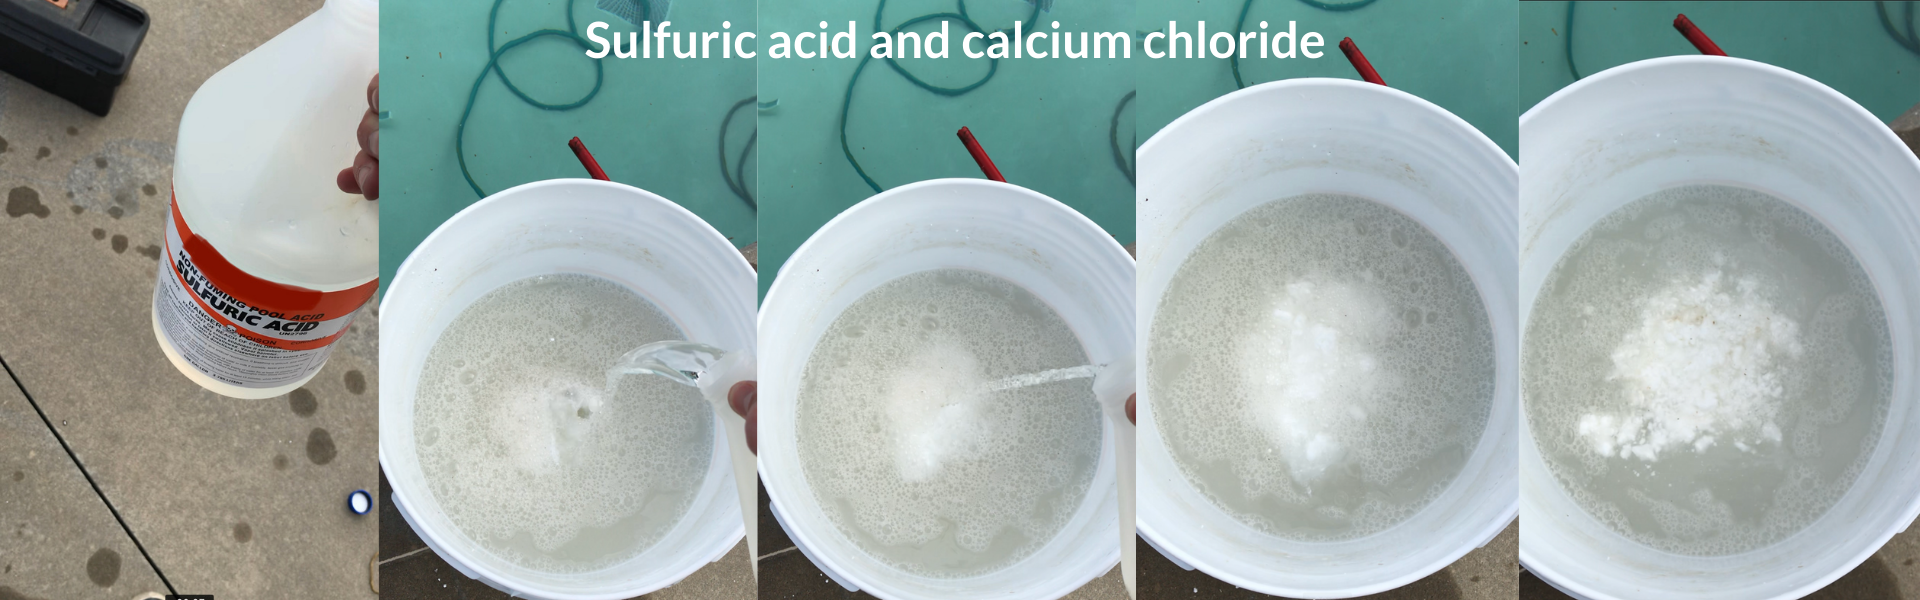 Sulfuric acid and calcium chloride